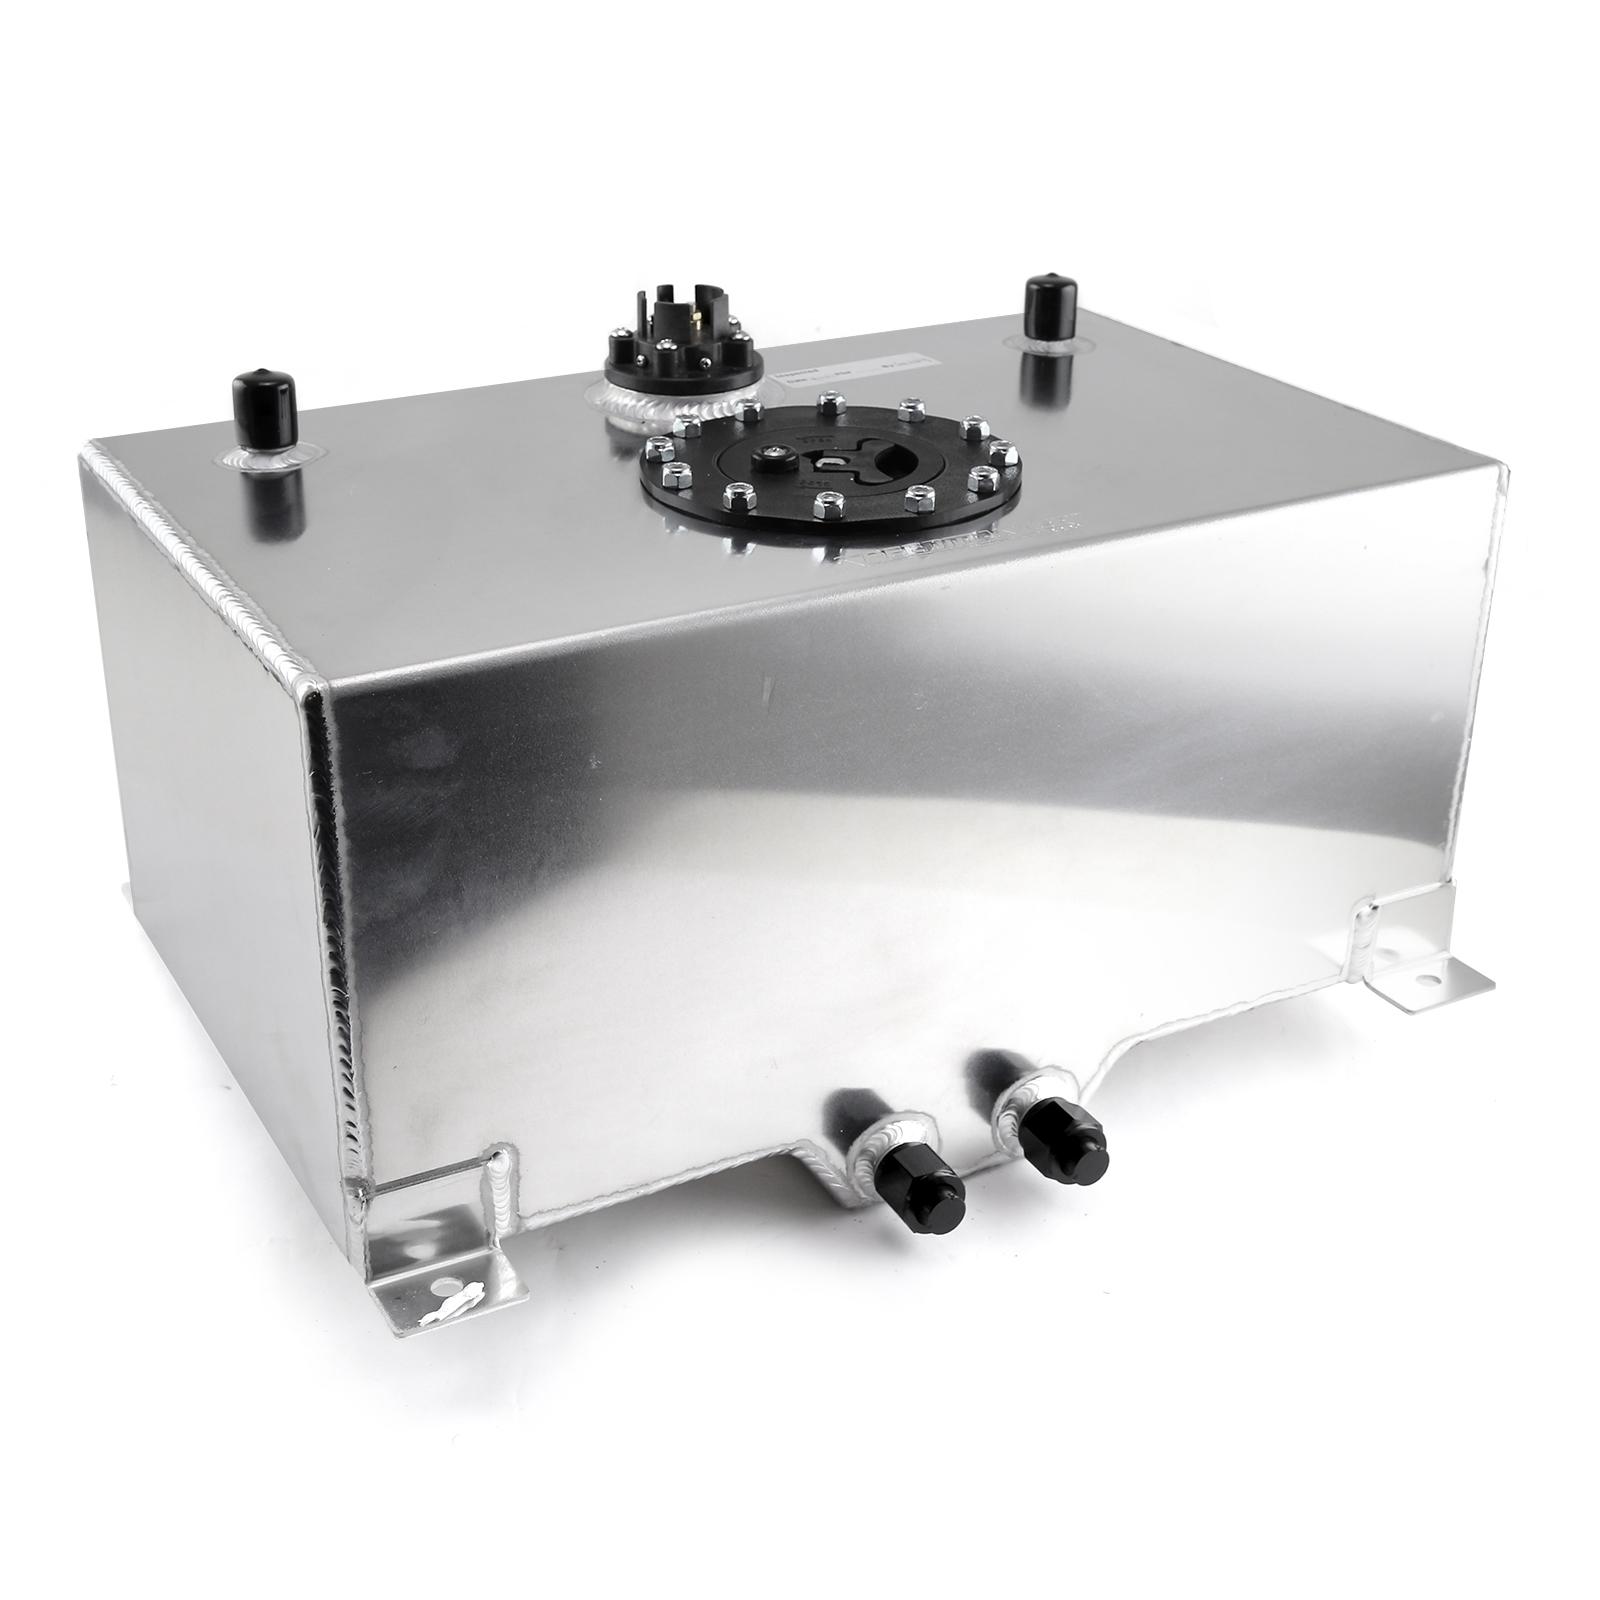 Speedmaster 8 Gallon / 30 Litre Aluminum Fuel Cell w/Sending Unit